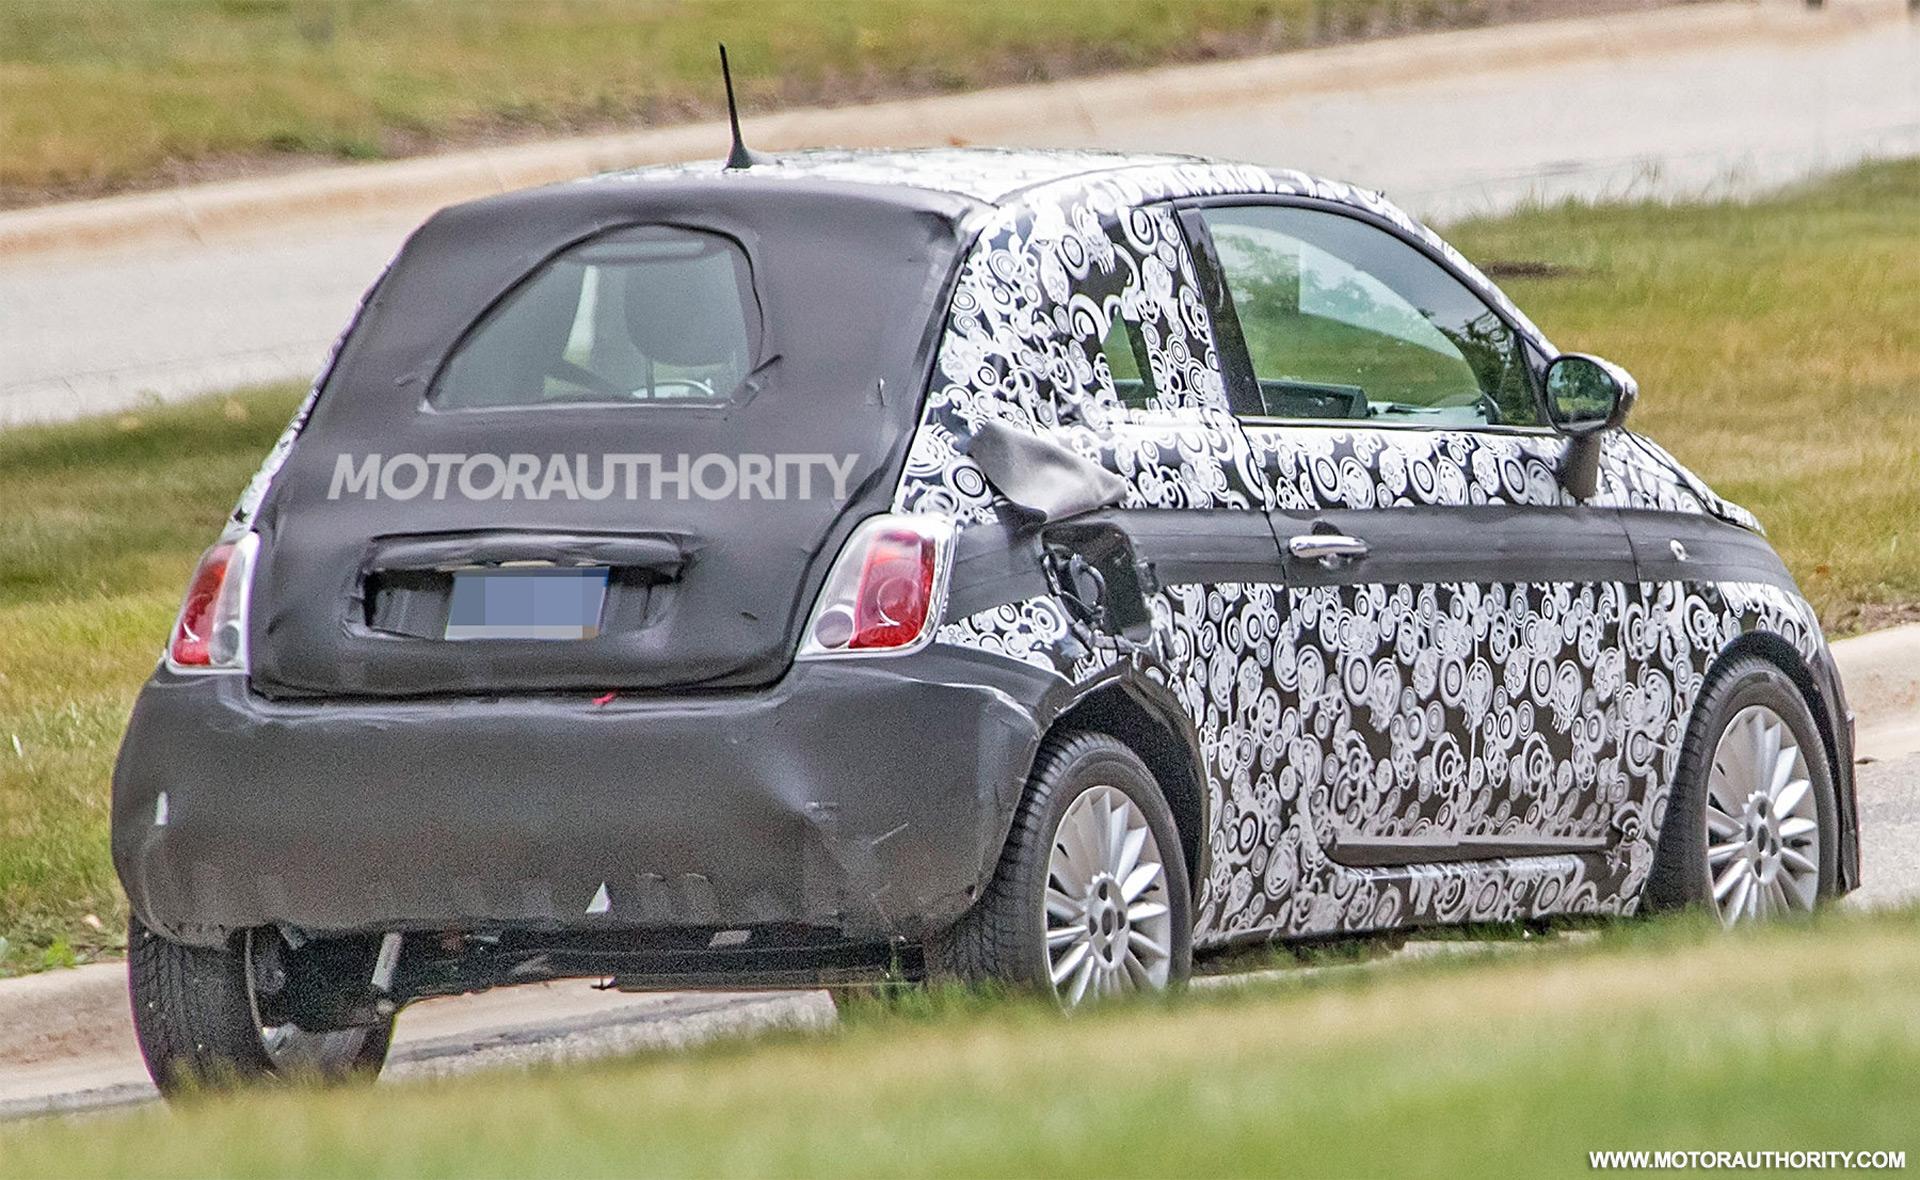 2020 - [Fiat] 500 e - Page 7 2020-fiat-500e-spy-shots--image-via-s-baldauf-sb-medien_100708604_h